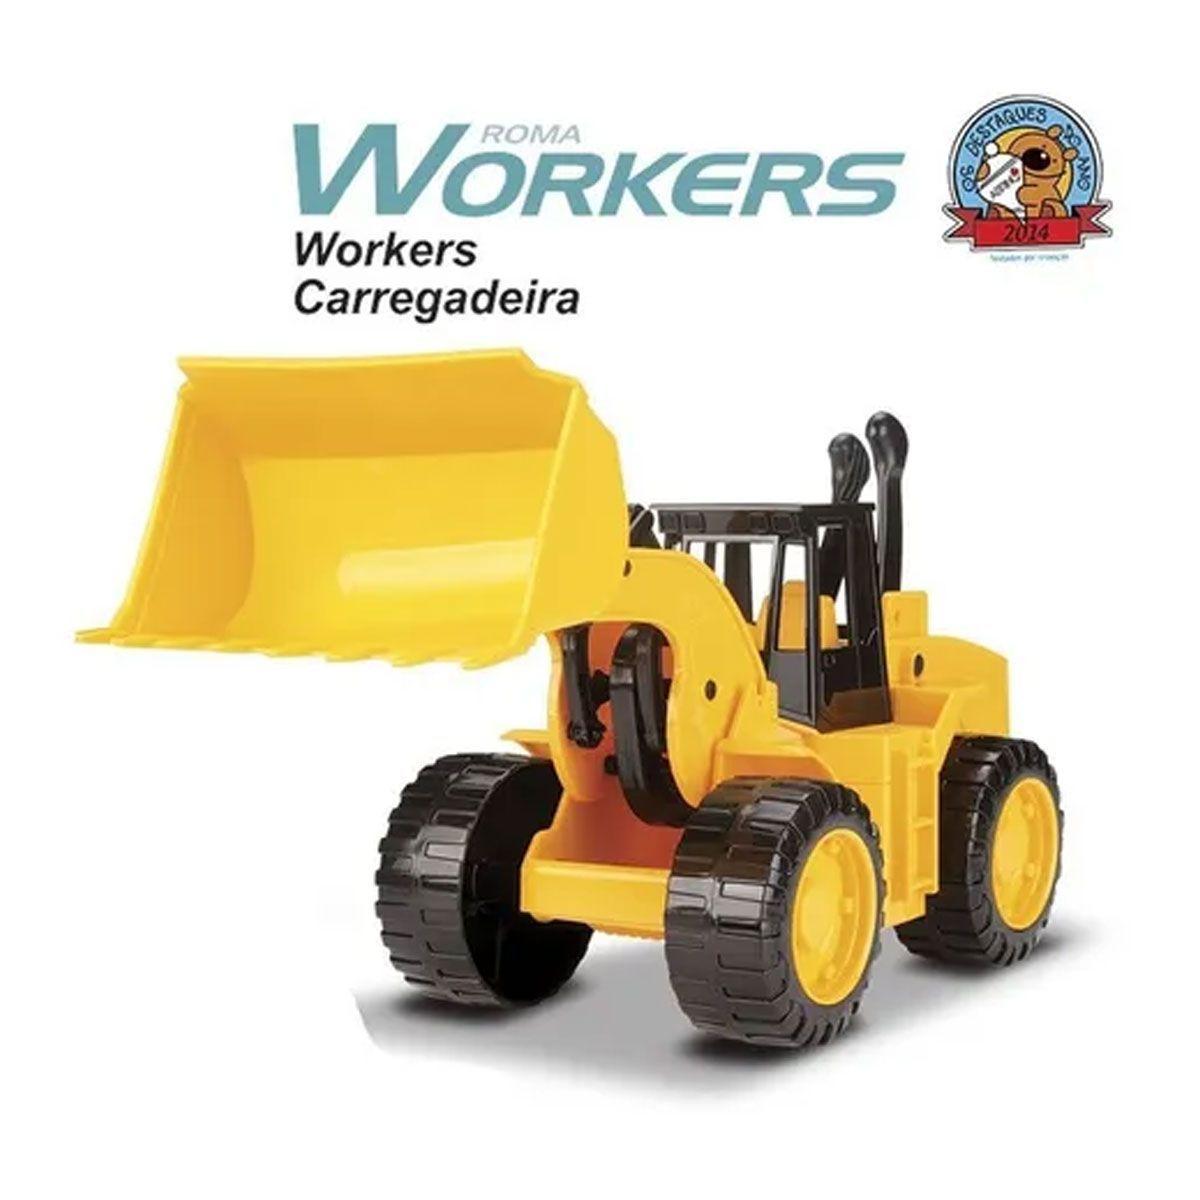 Roma Workers Trator Carregadeira - Roma Brinquedos